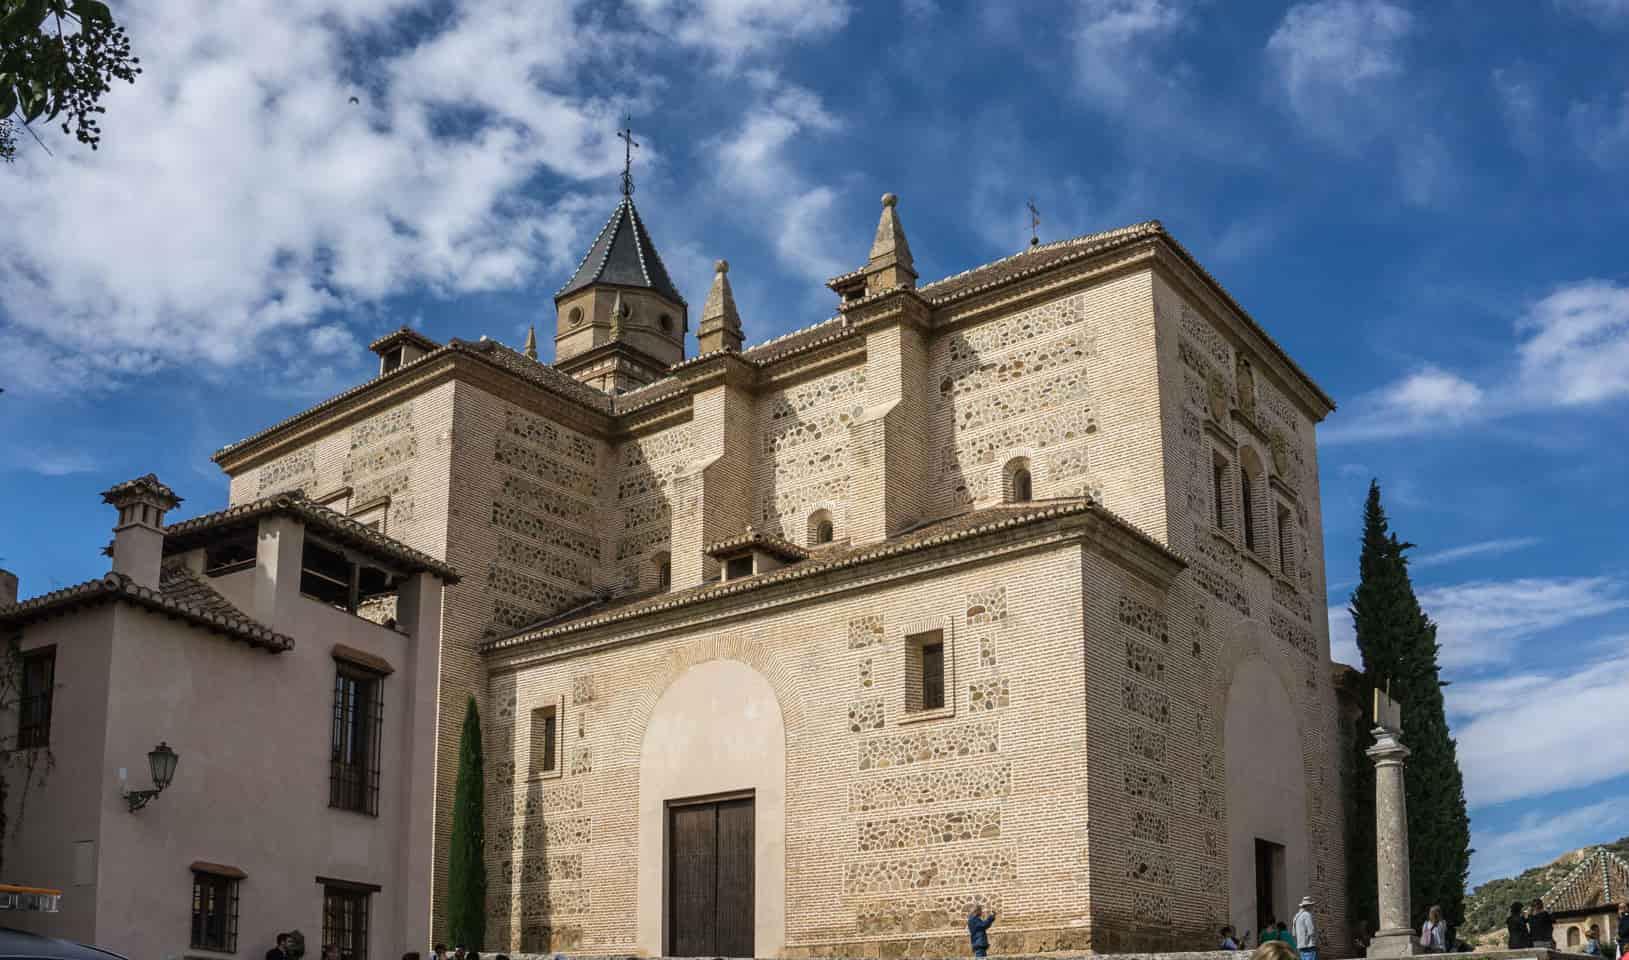 Храм Санта-Мария-де-ла-Альгамбра - фото